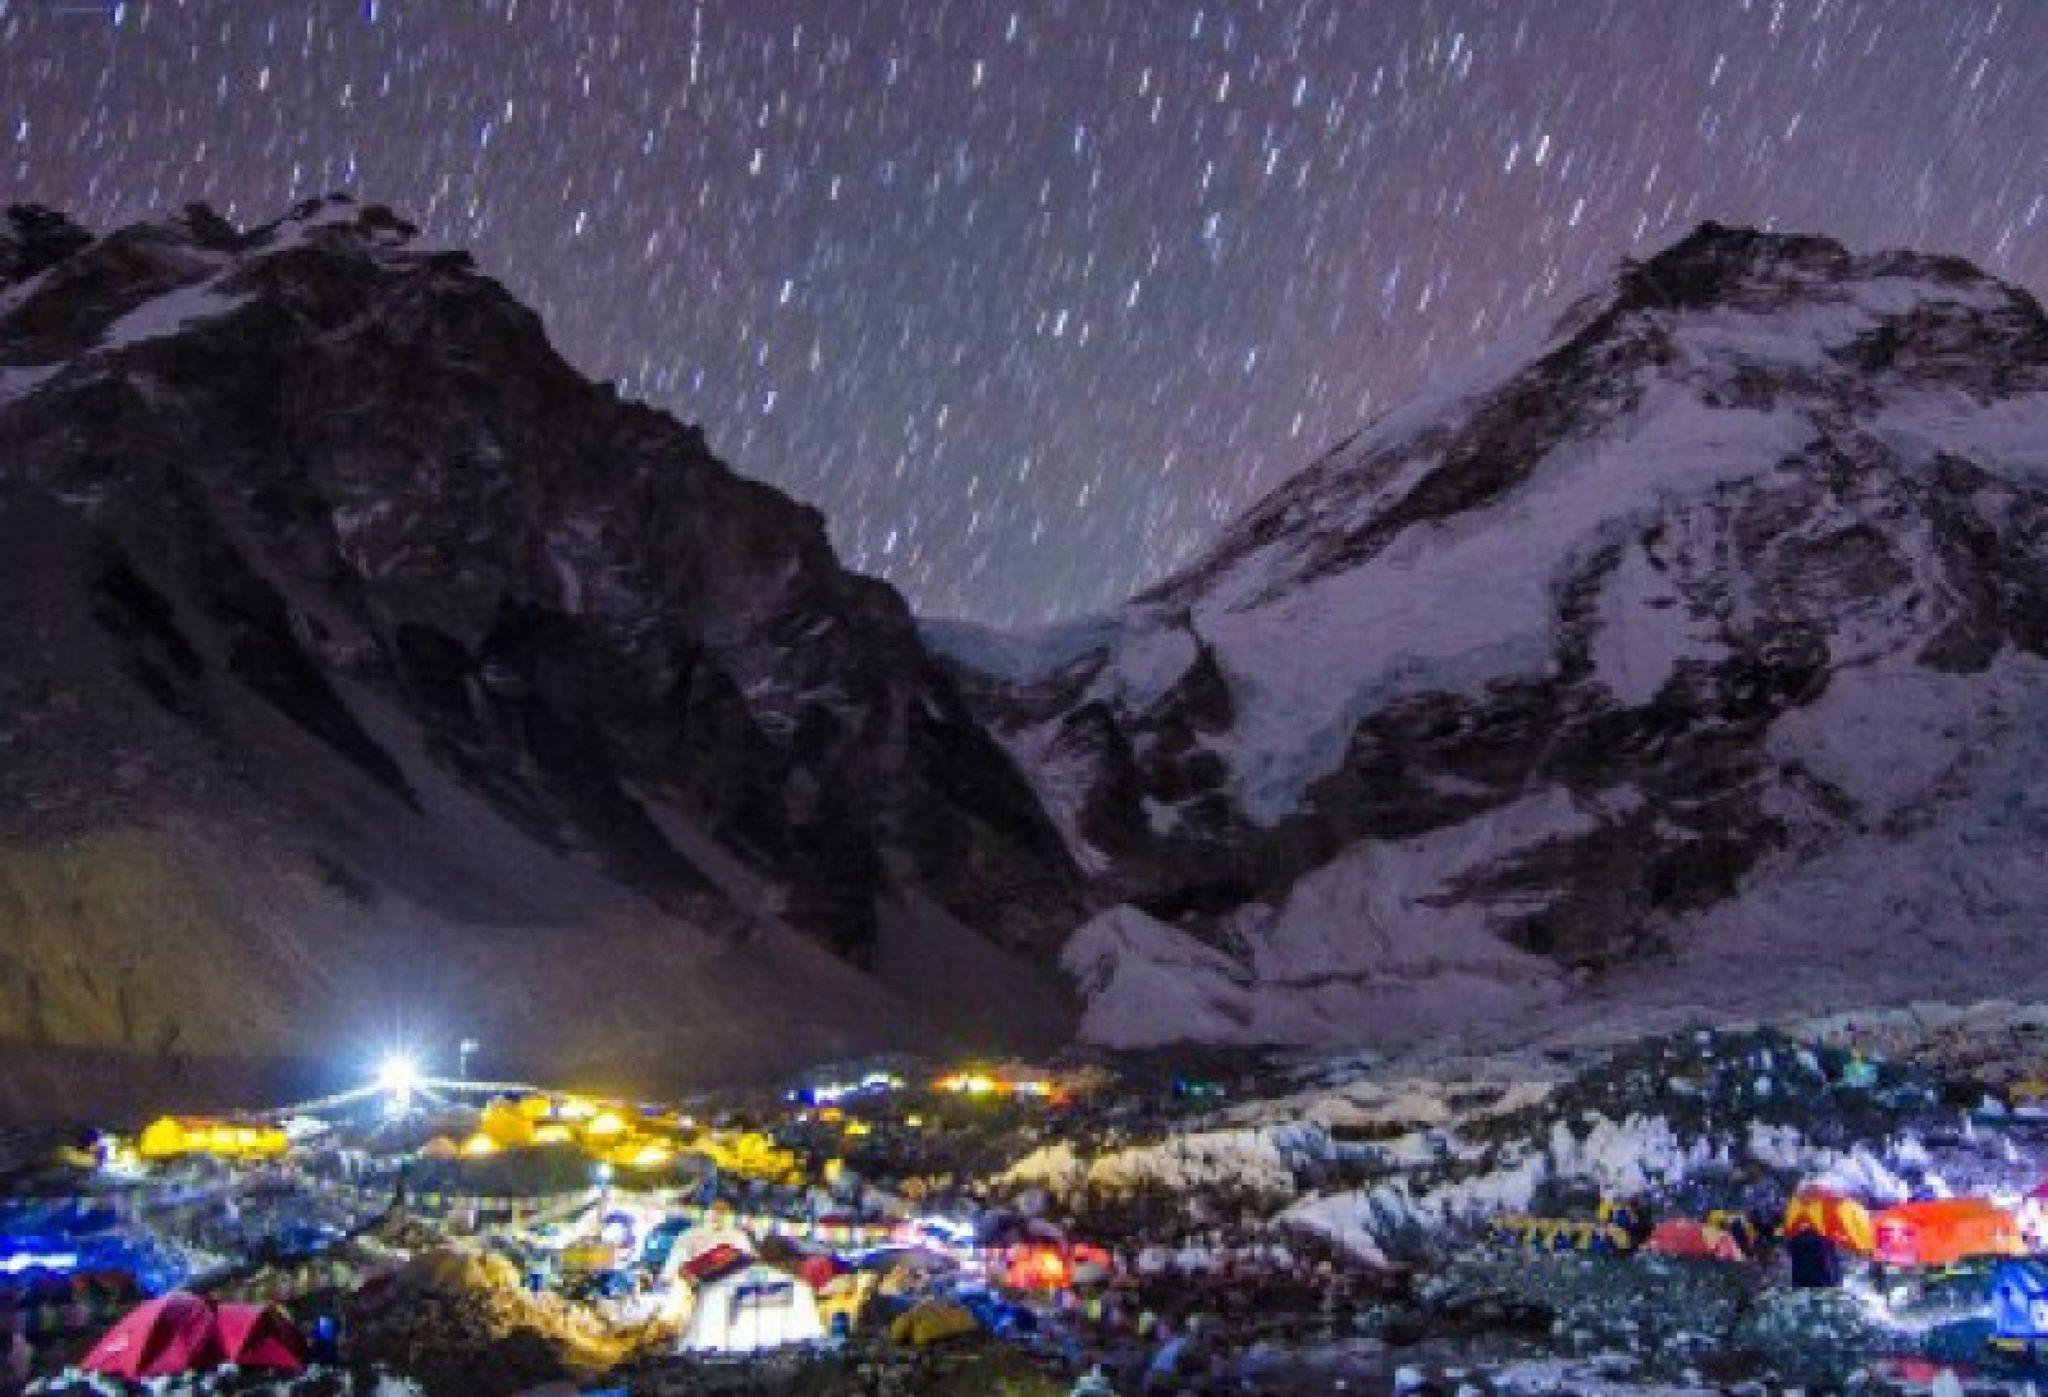 Everest Base Camp trek & Kala Patthar trekking holiday in Nepal